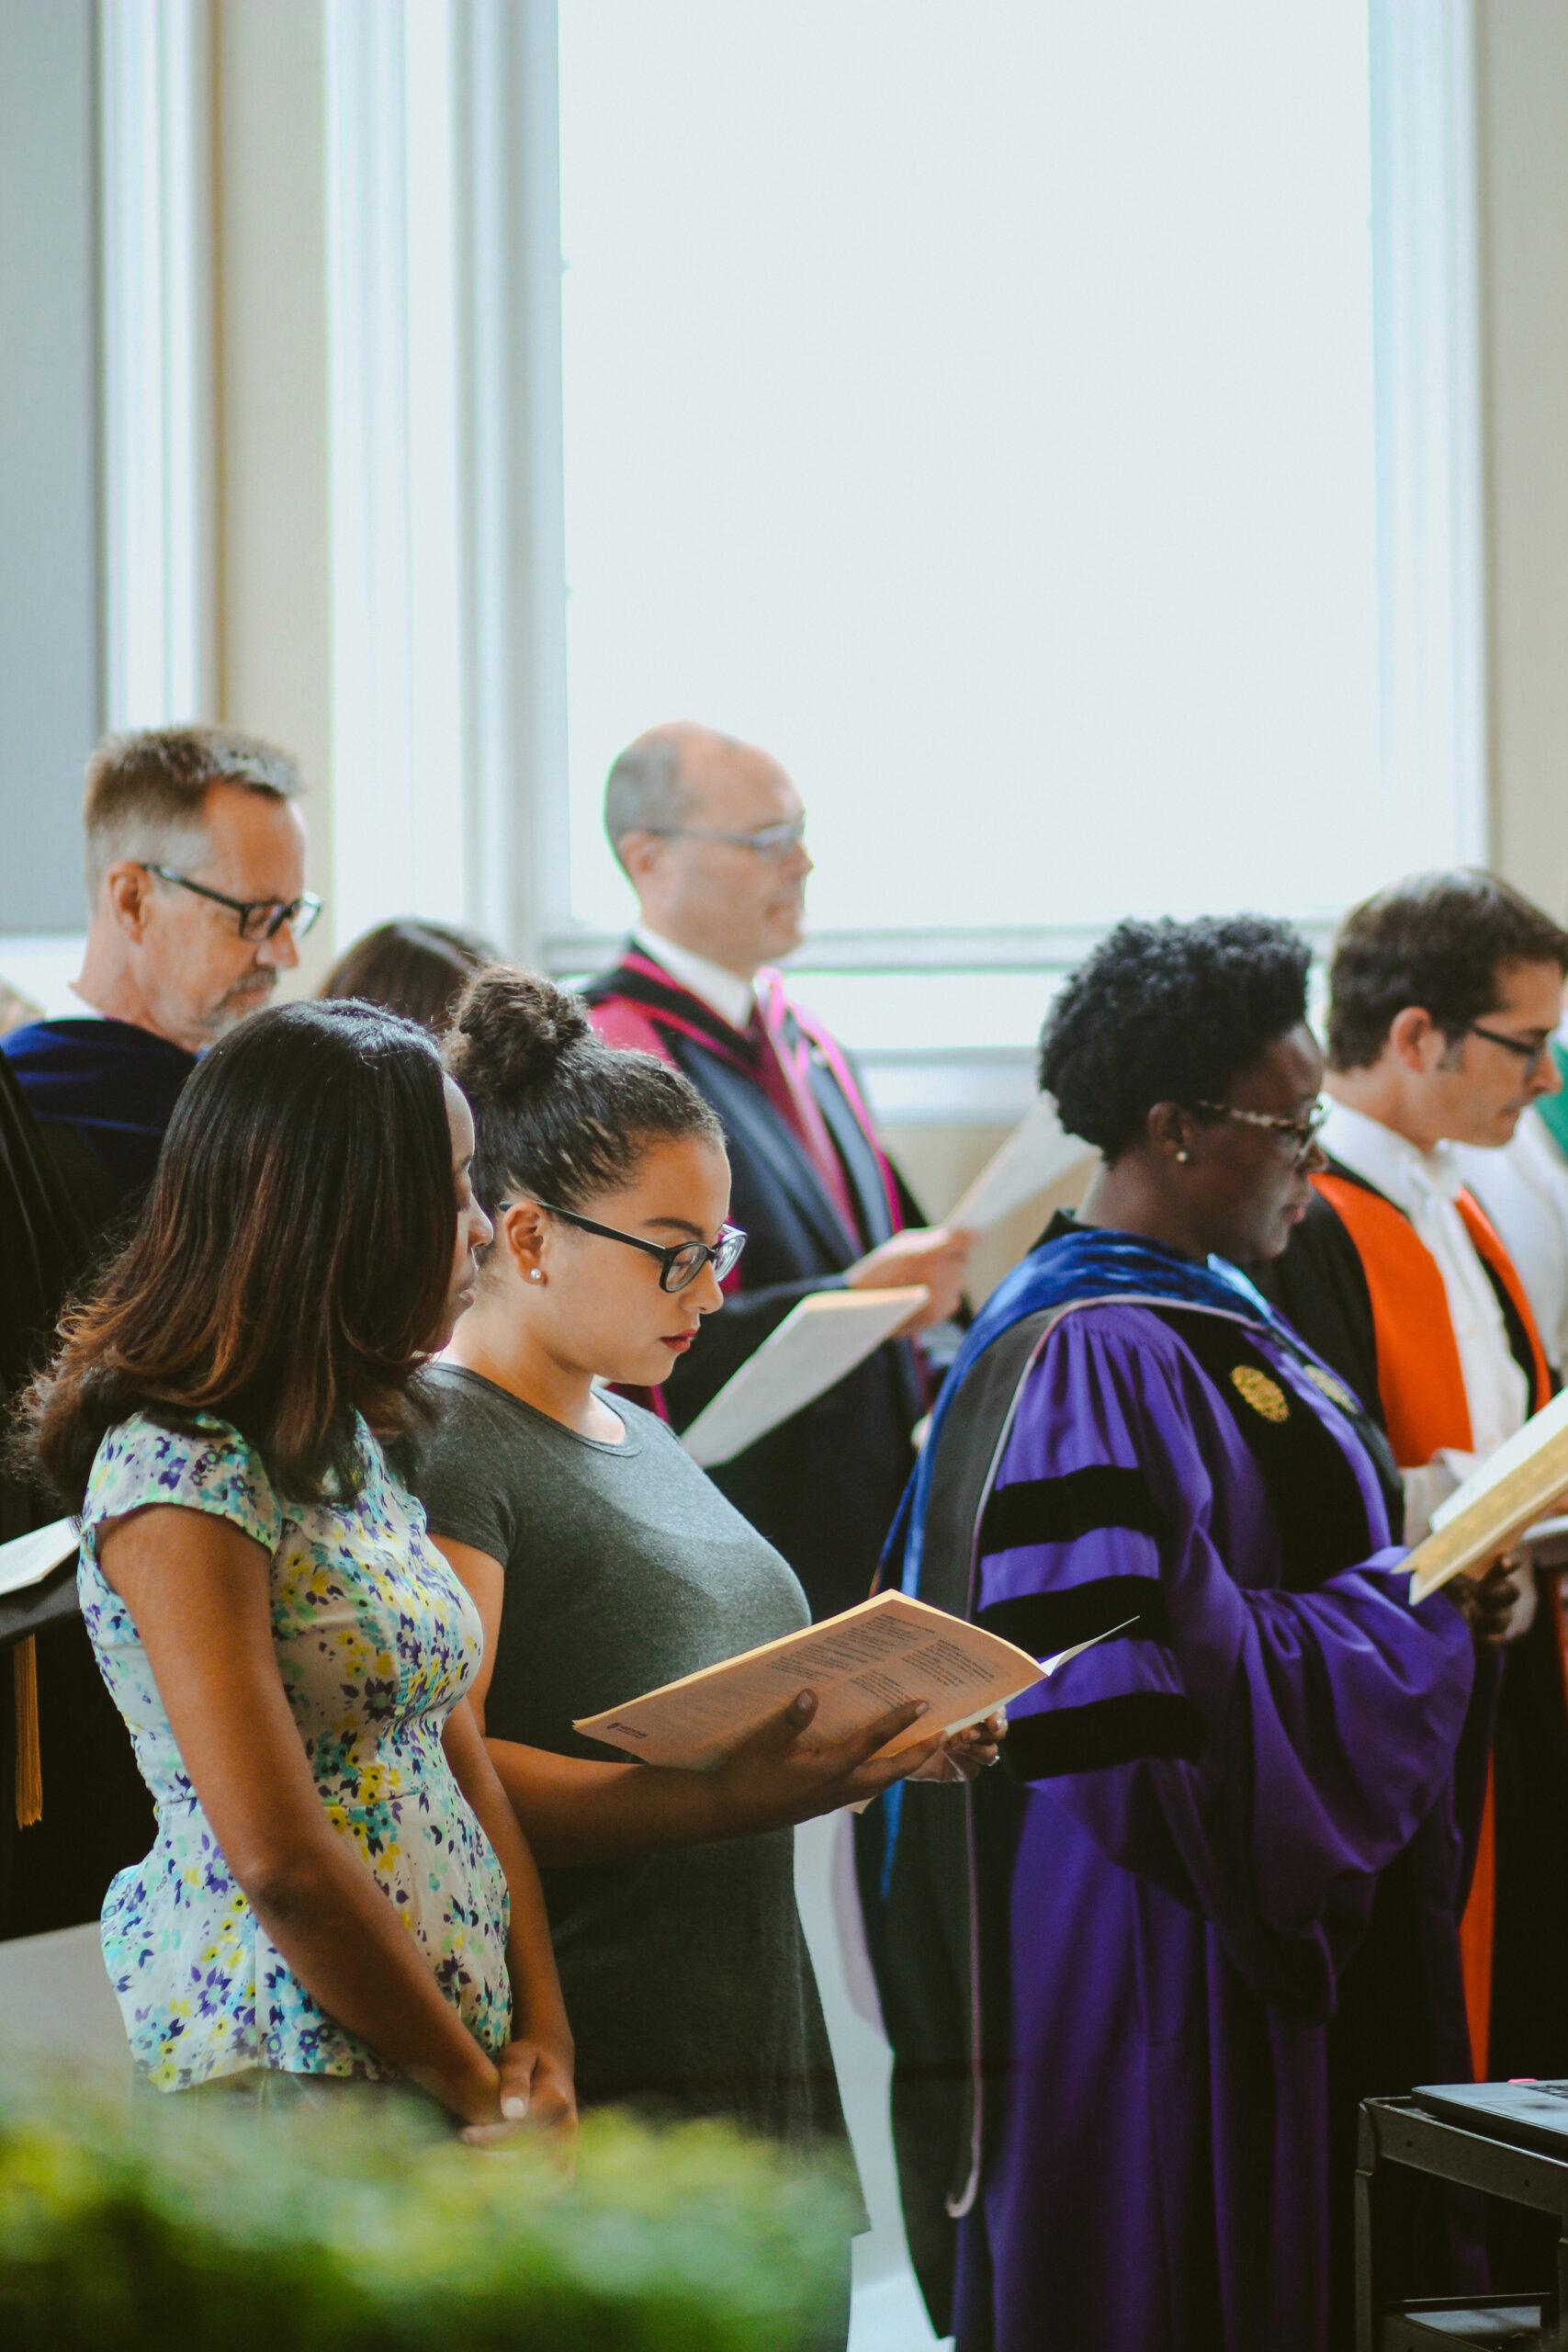 Congregation sings in chapel pews.